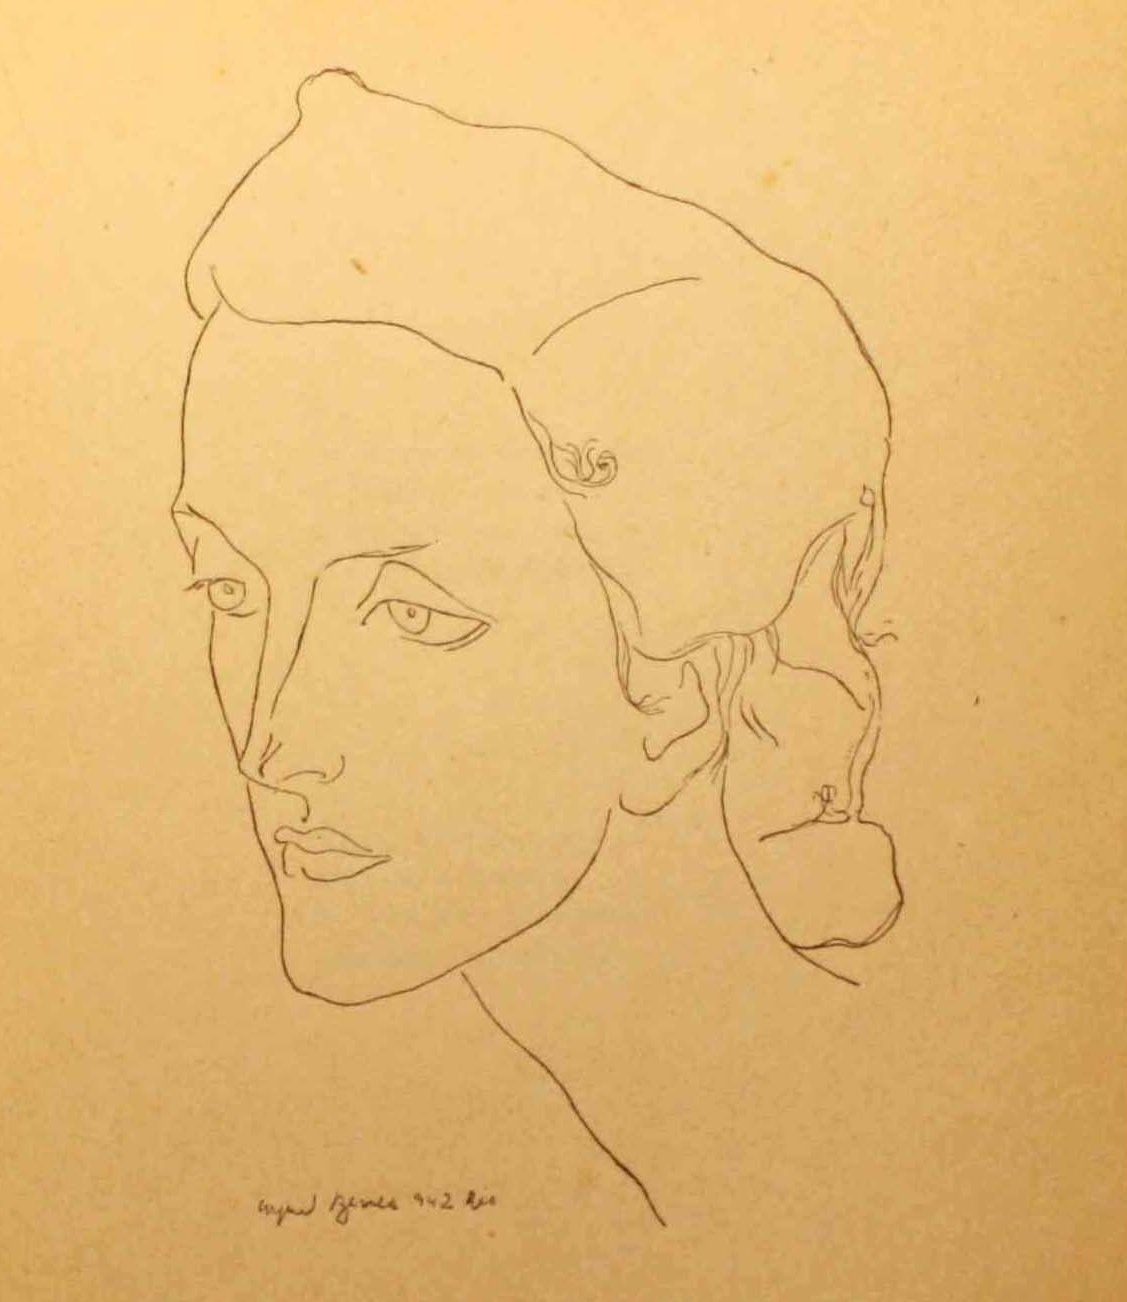 O retrato desenhado por Arpad Szenes, 1942